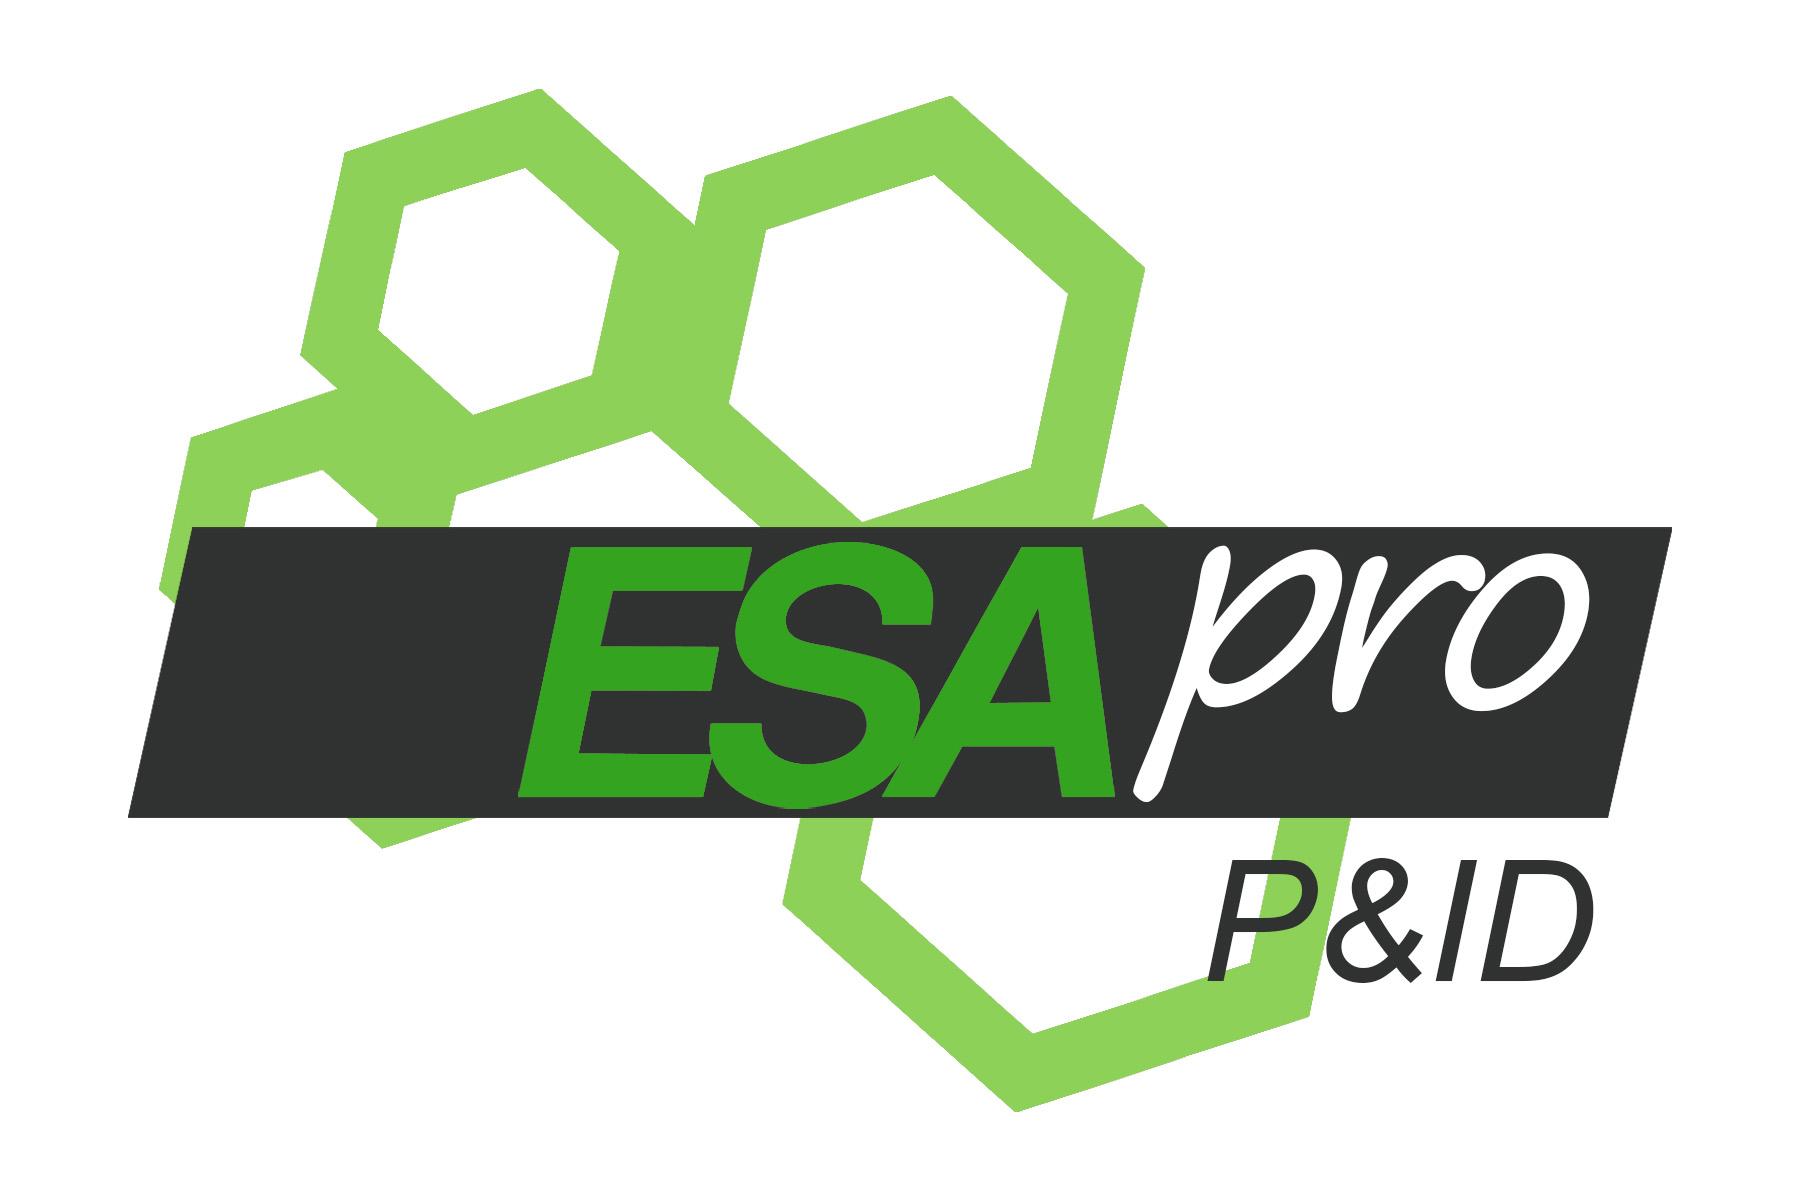 esapro-p&id-image-1